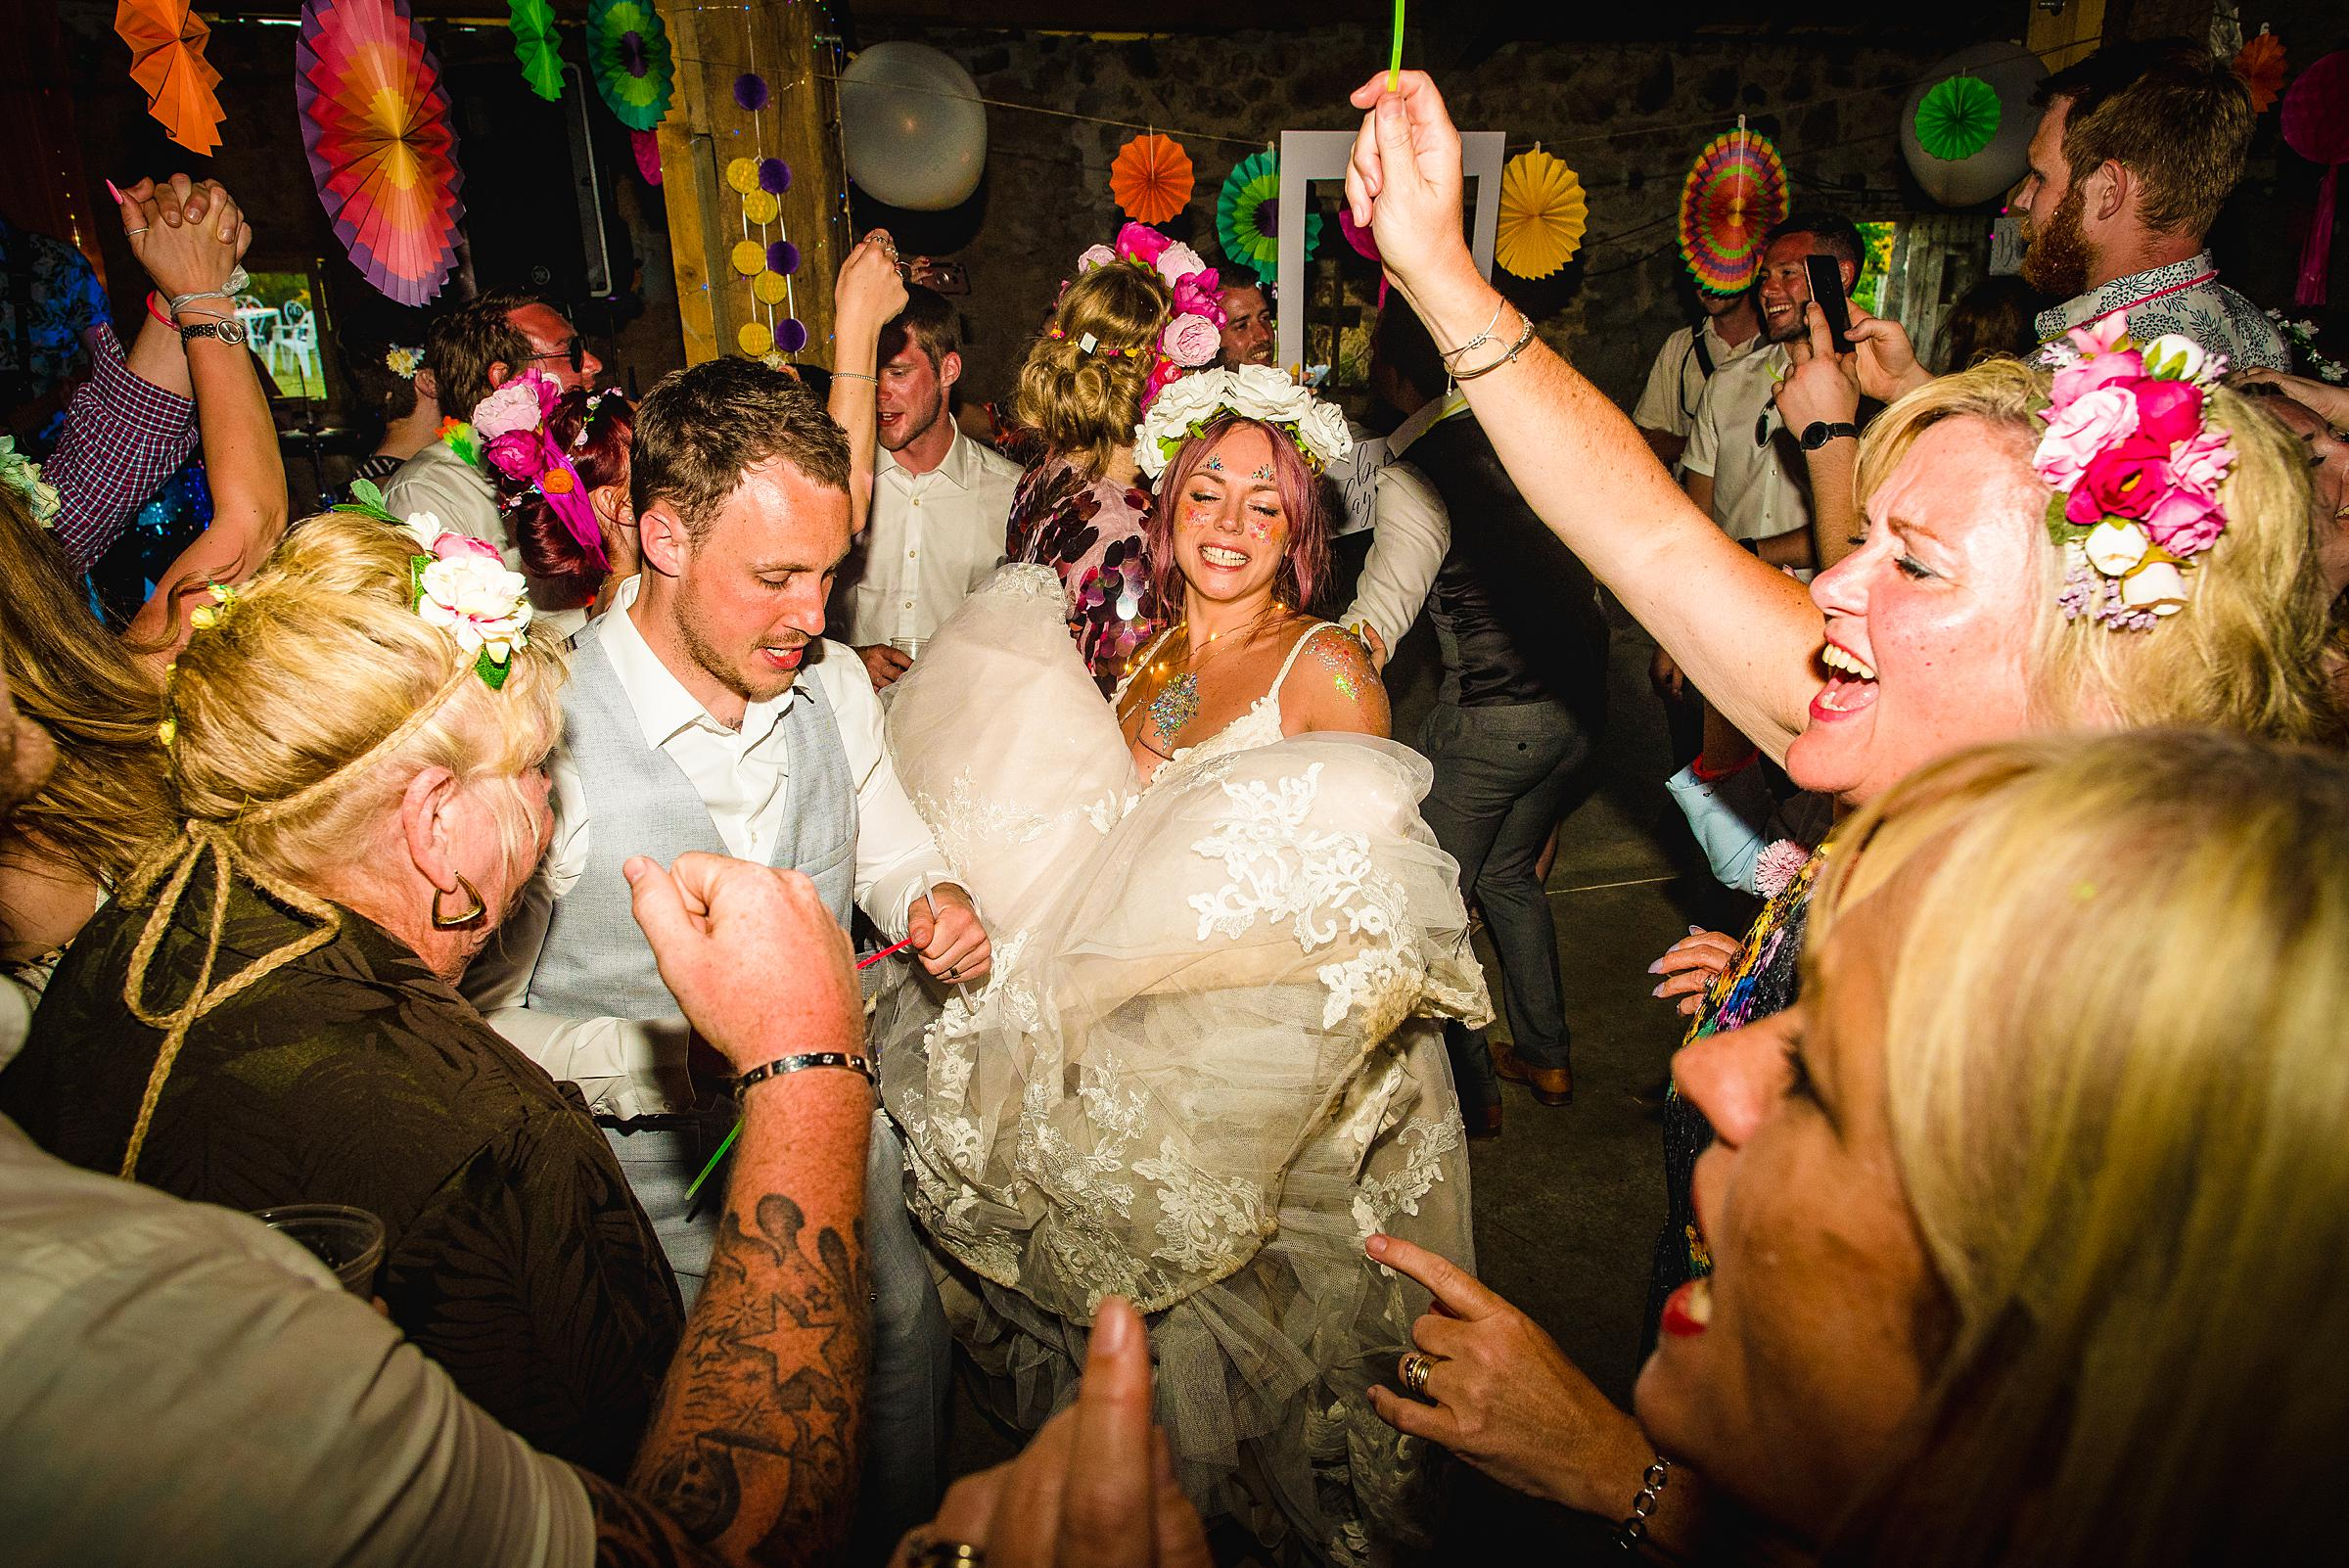 Festival Wedding in France - Tattooed Bride